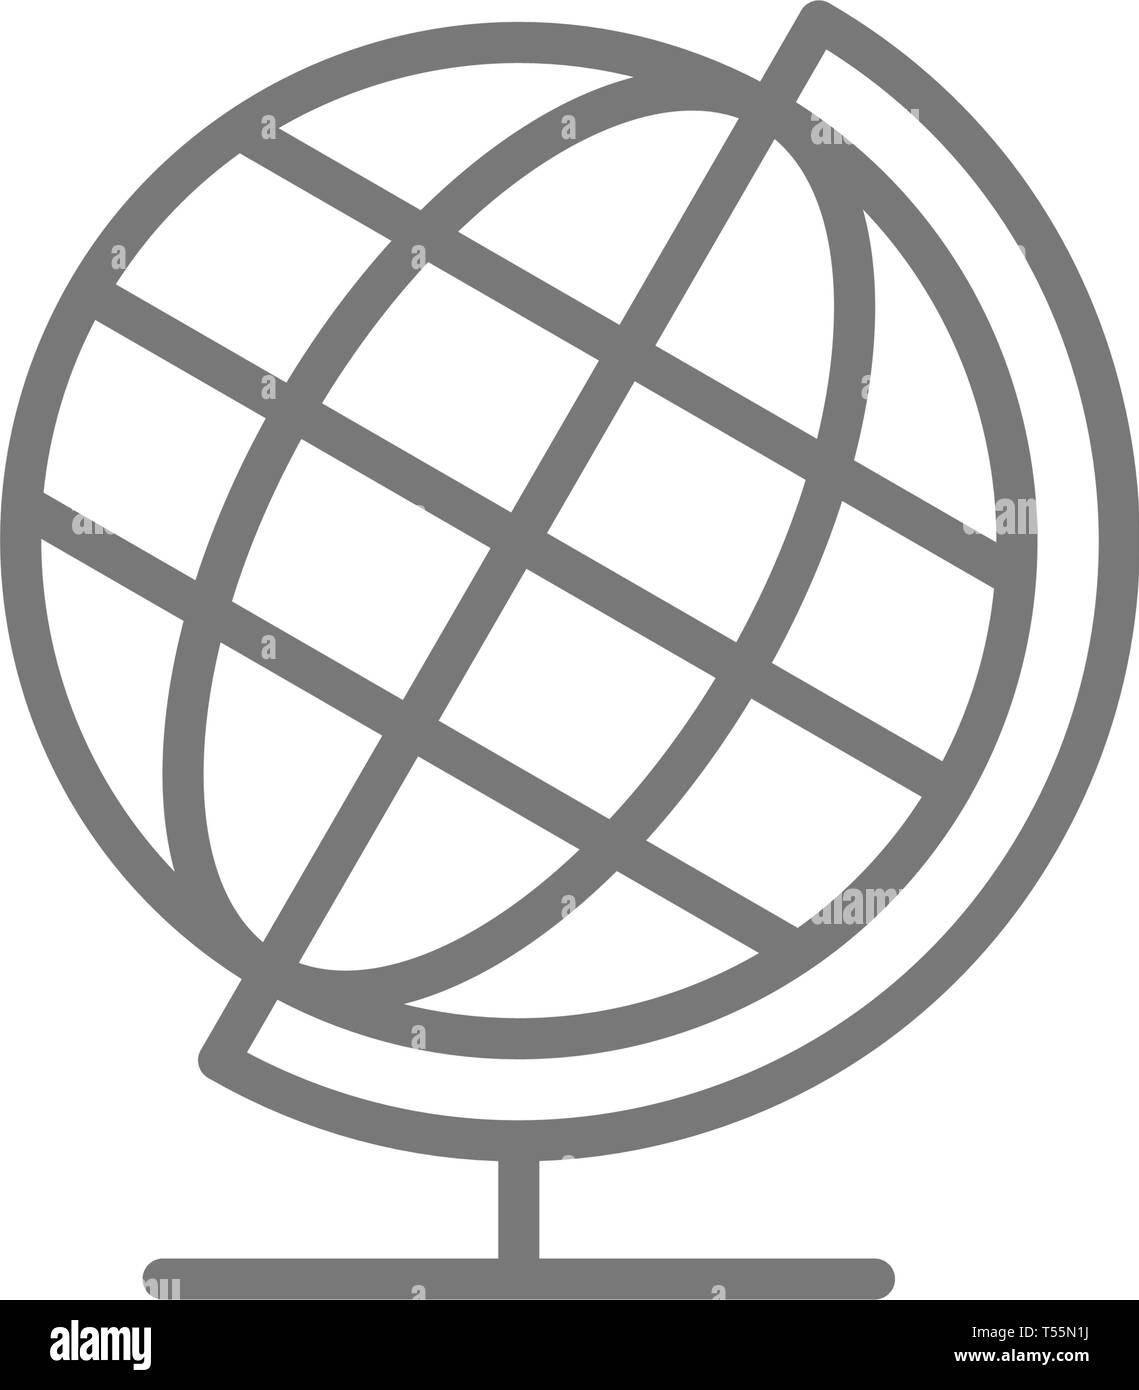 School globe, earth model line icon. - Stock Image